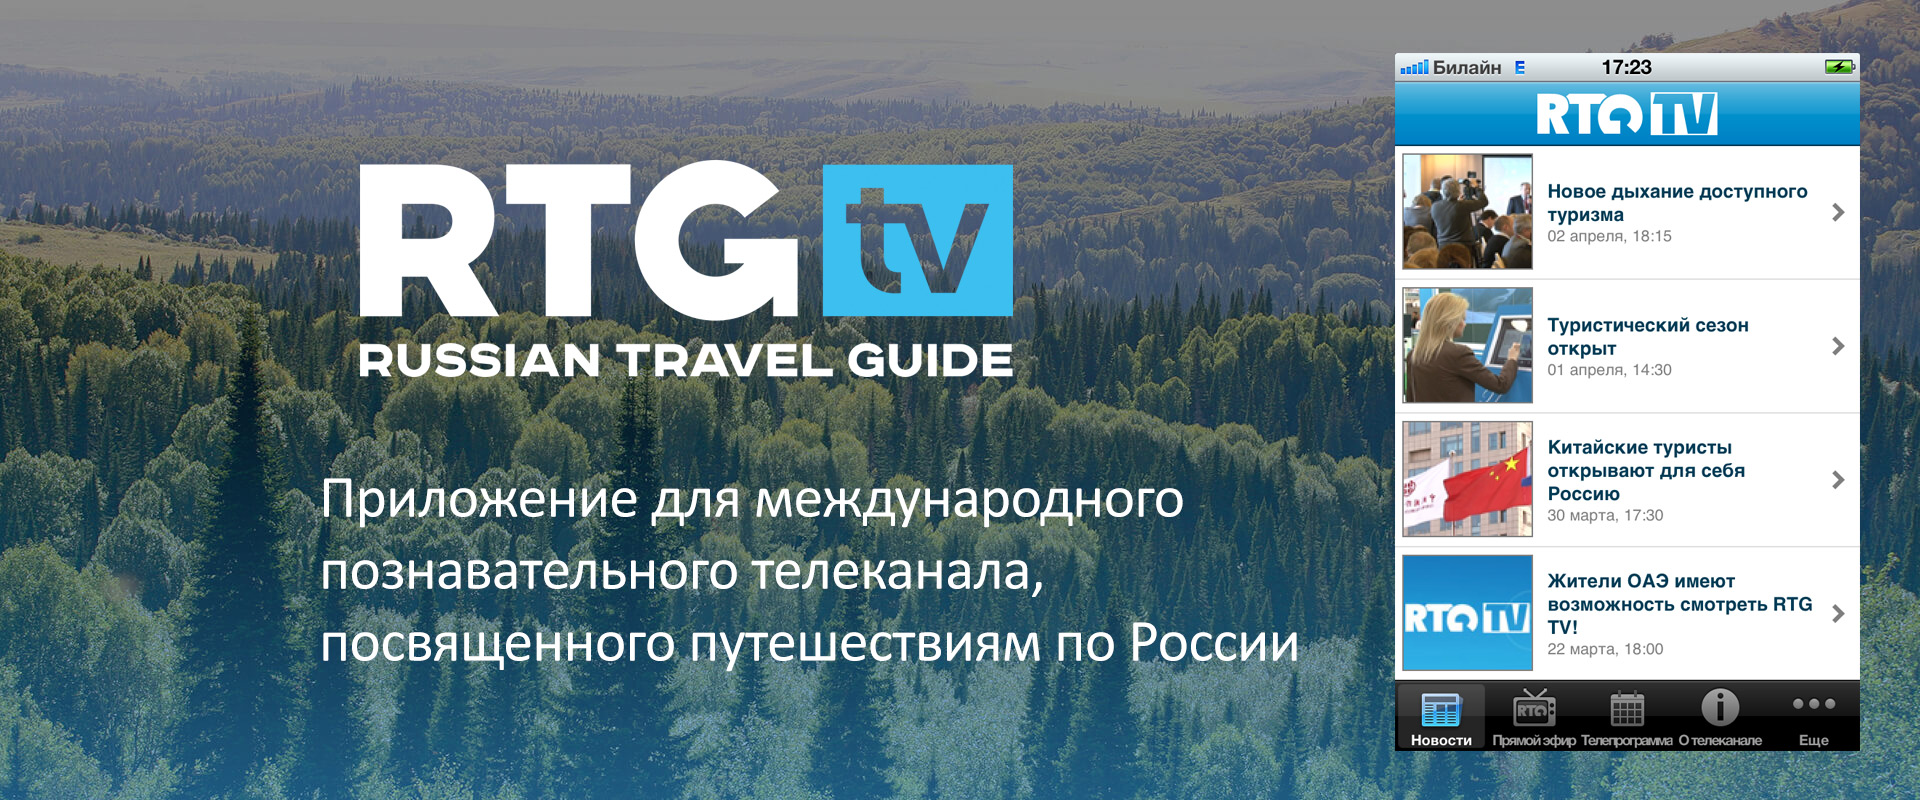 slide_app_rtgtv_ru